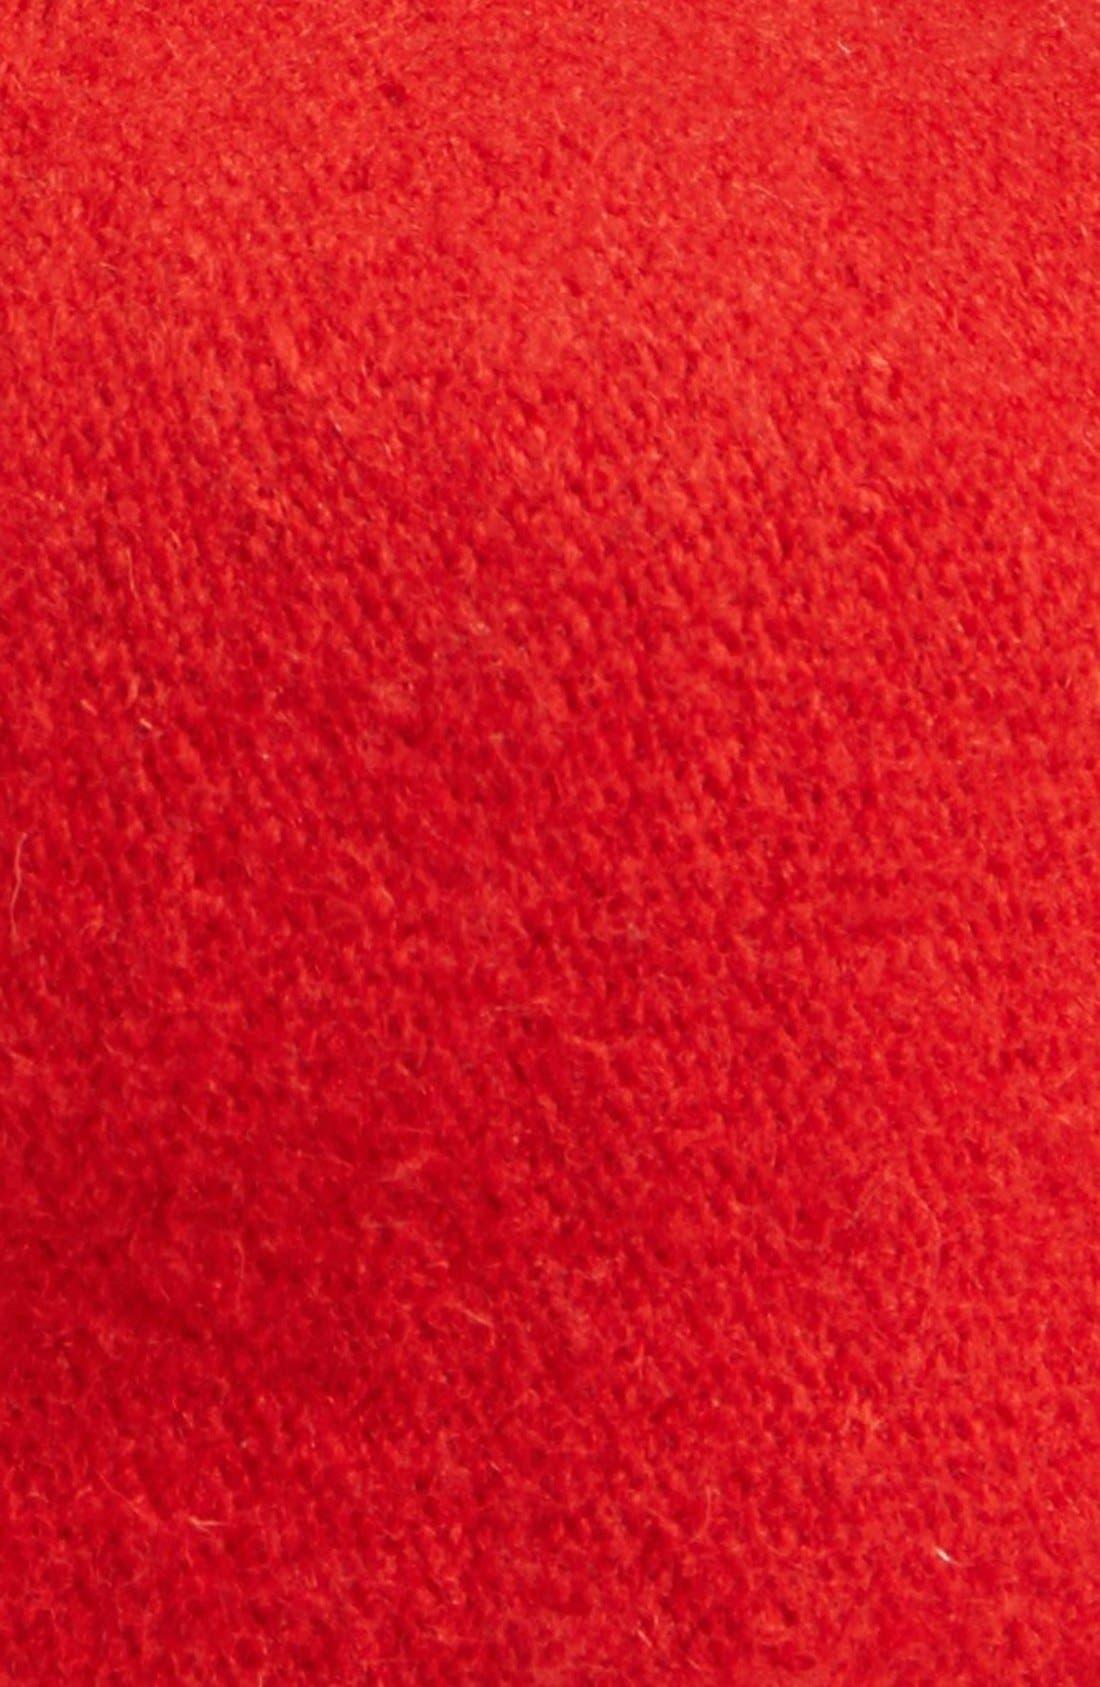 Alternate Image 2  - Helene BermanStudded Ears WoolBlend Cap